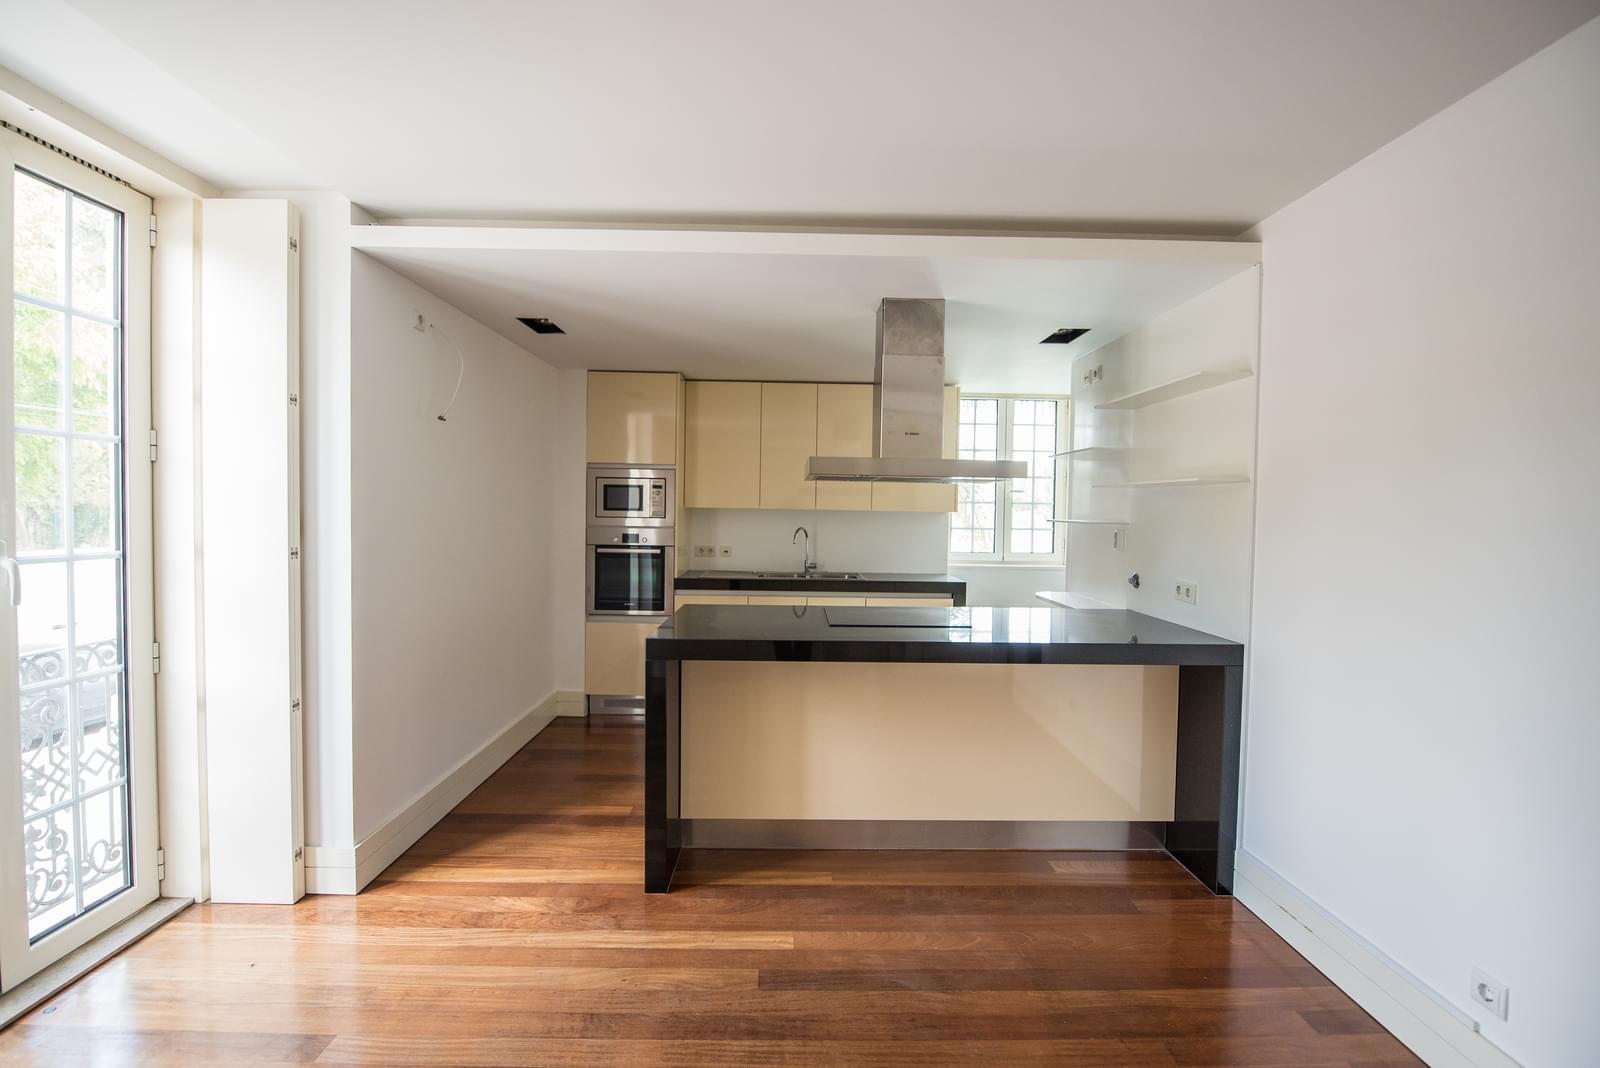 pf19211-apartamento-t4-lisboa-2cf06da8-05ab-40d4-be2d-b220a4f6597d